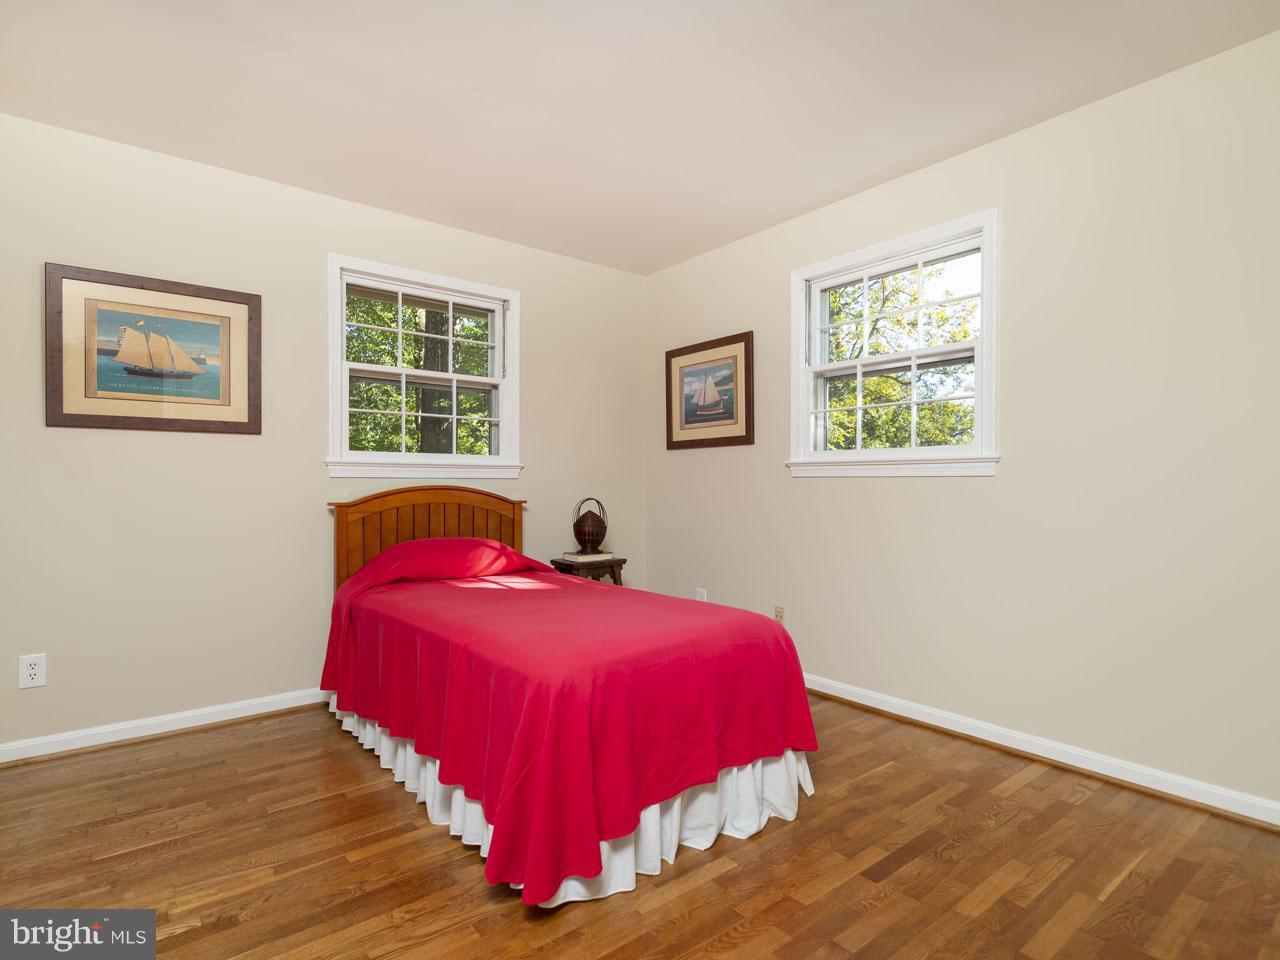 1010014728-300953035376-2021-09-05-13-50-24  |   | Annandale Delaware Real Estate For Sale | MLS# 1010014728  - Best of Northern Virginia